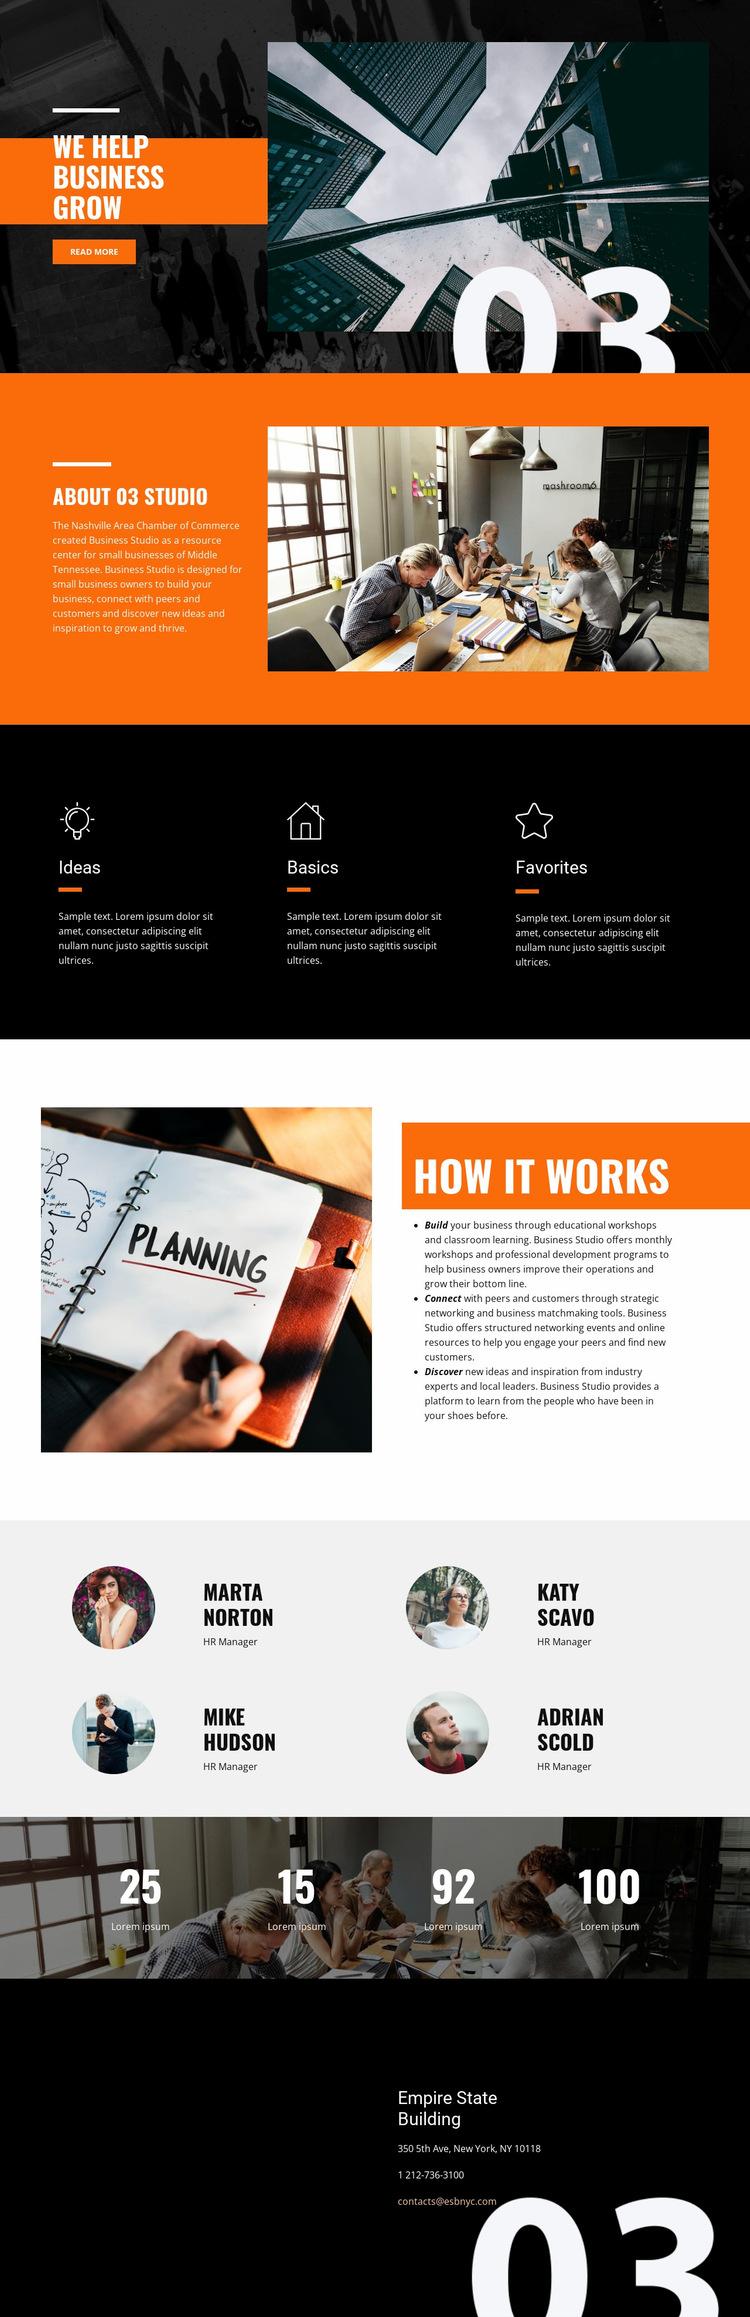 Business Grow Website Builder